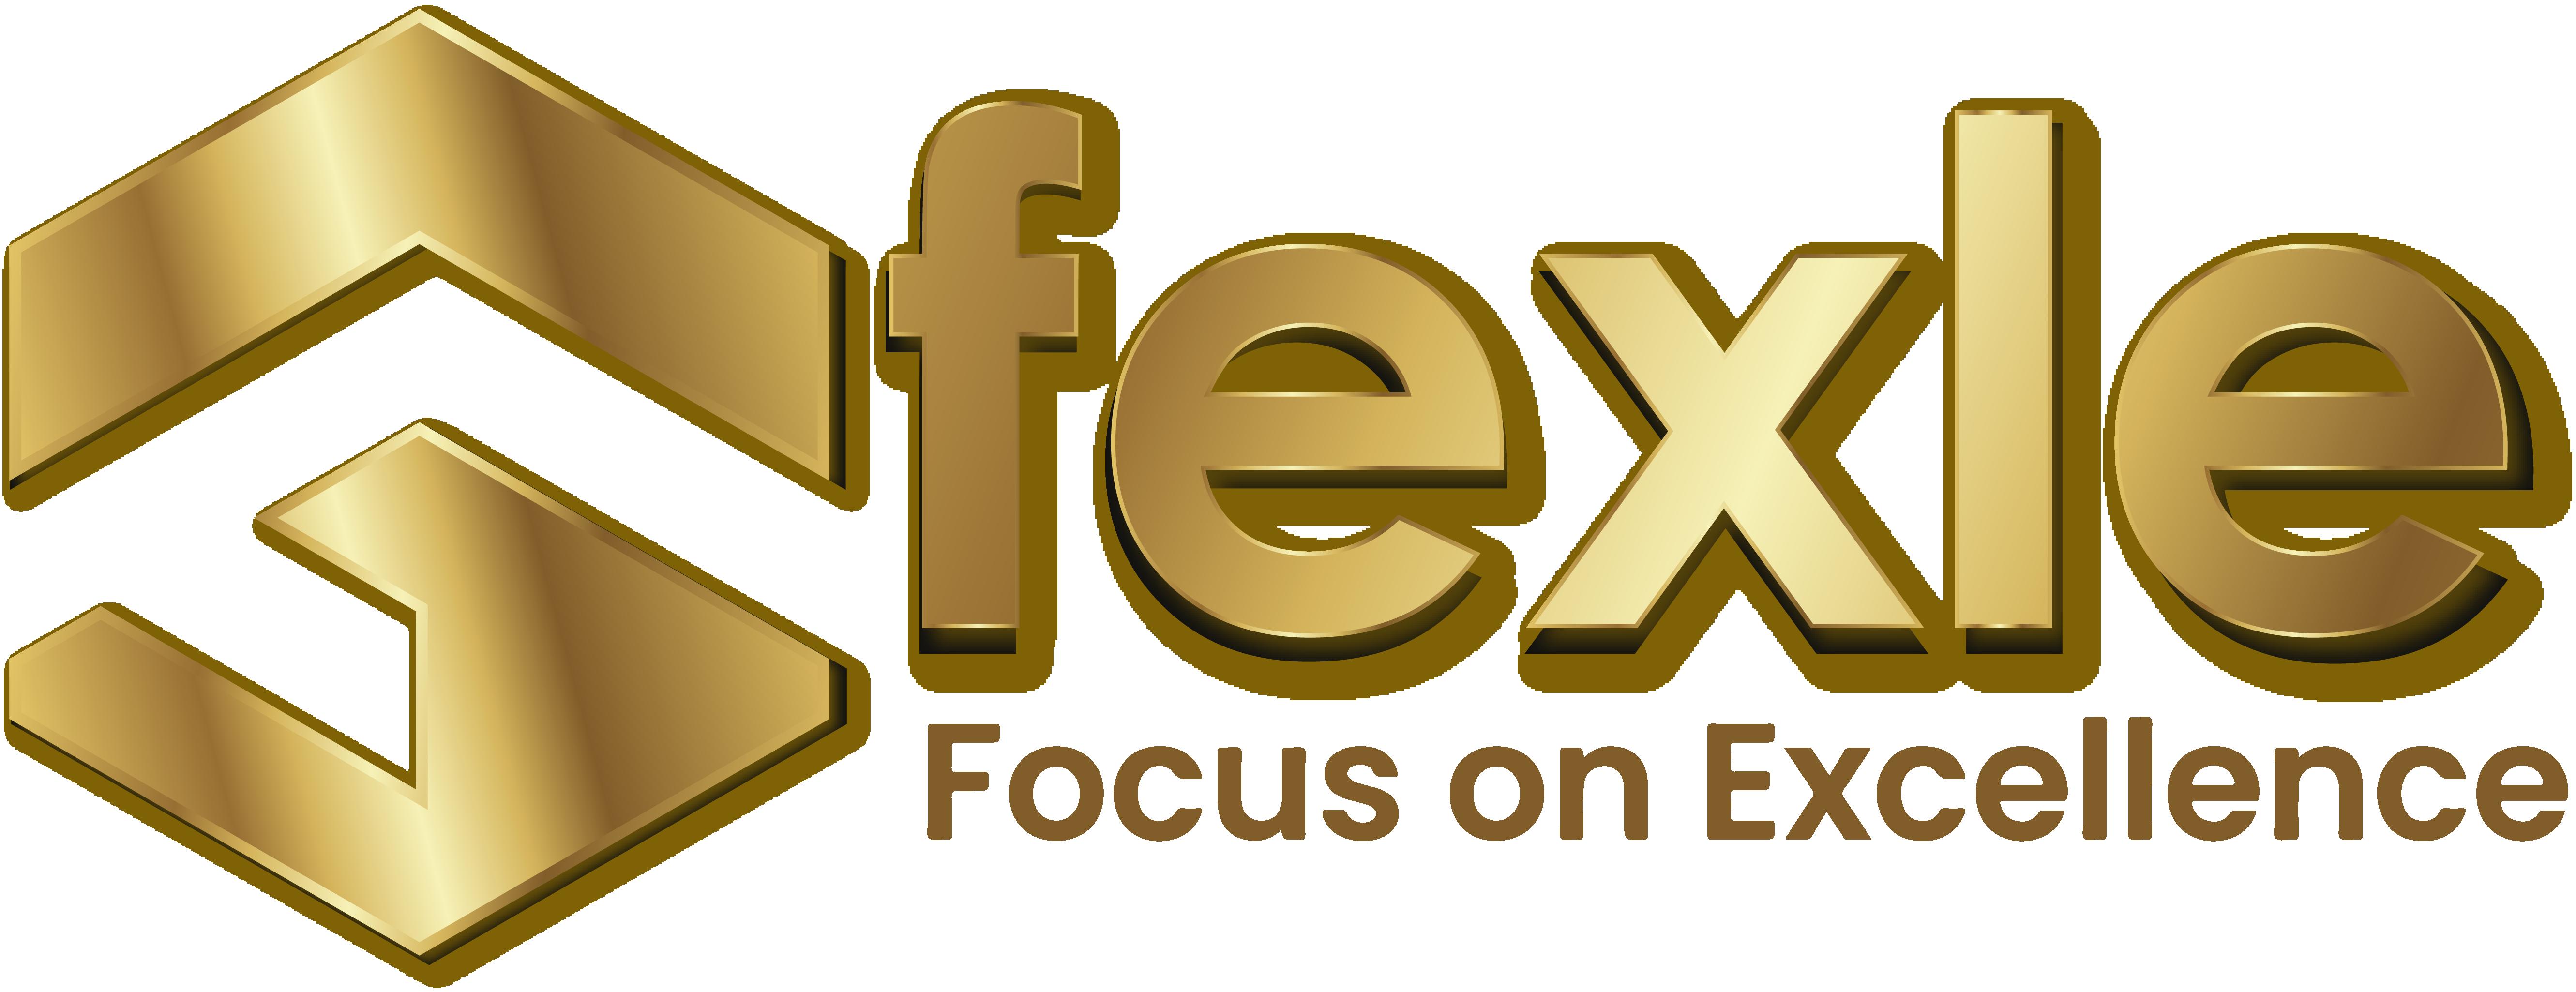 Fexle Logo